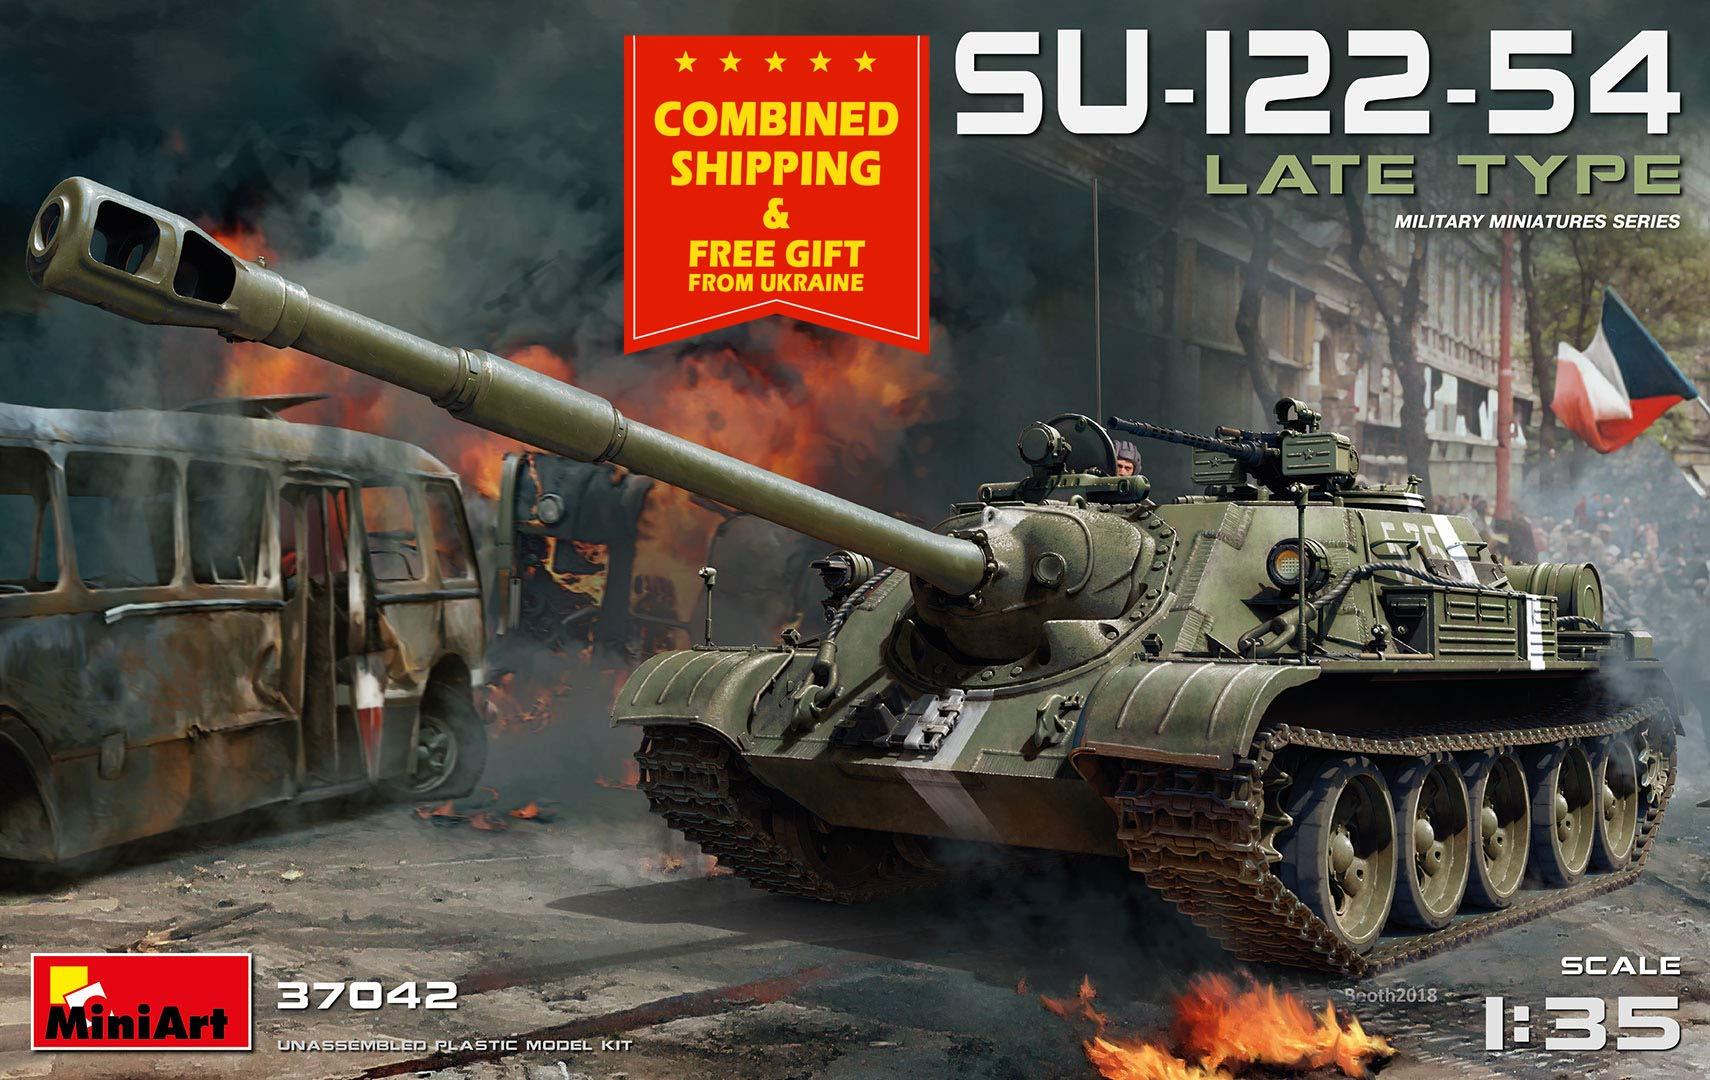 MINIART 37042 SU-122-54 Late Type USSR self-propelled artil 1/35 Scale Model kit